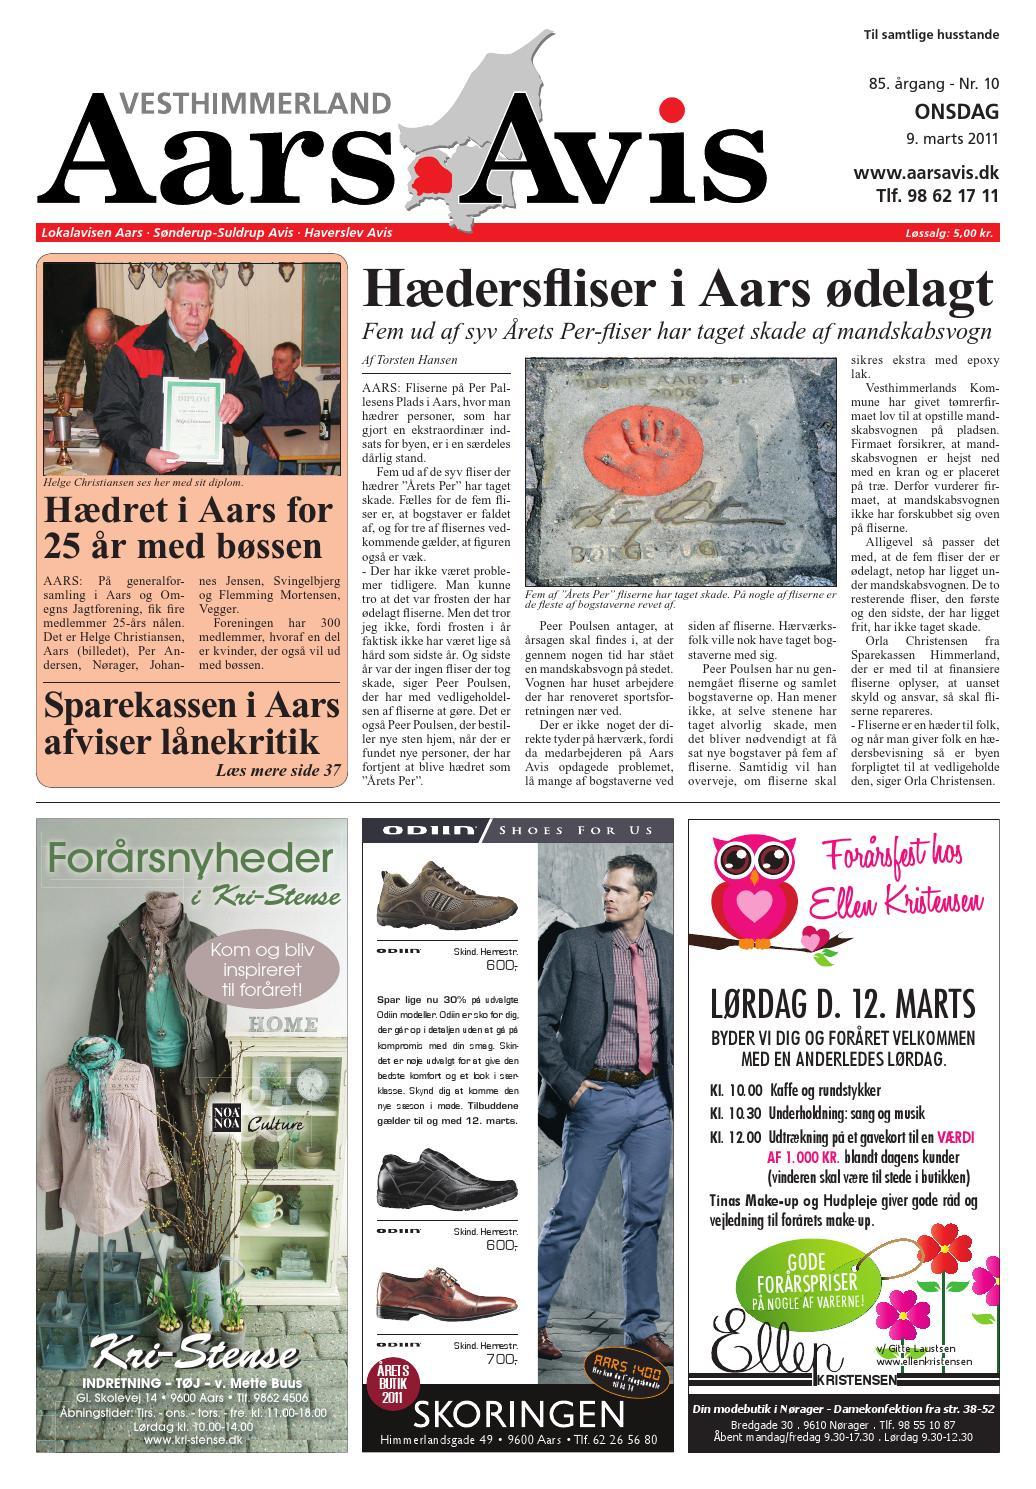 Aars avis 2011 03 09 by Aars Avis - issuu 388bb8b279ea4